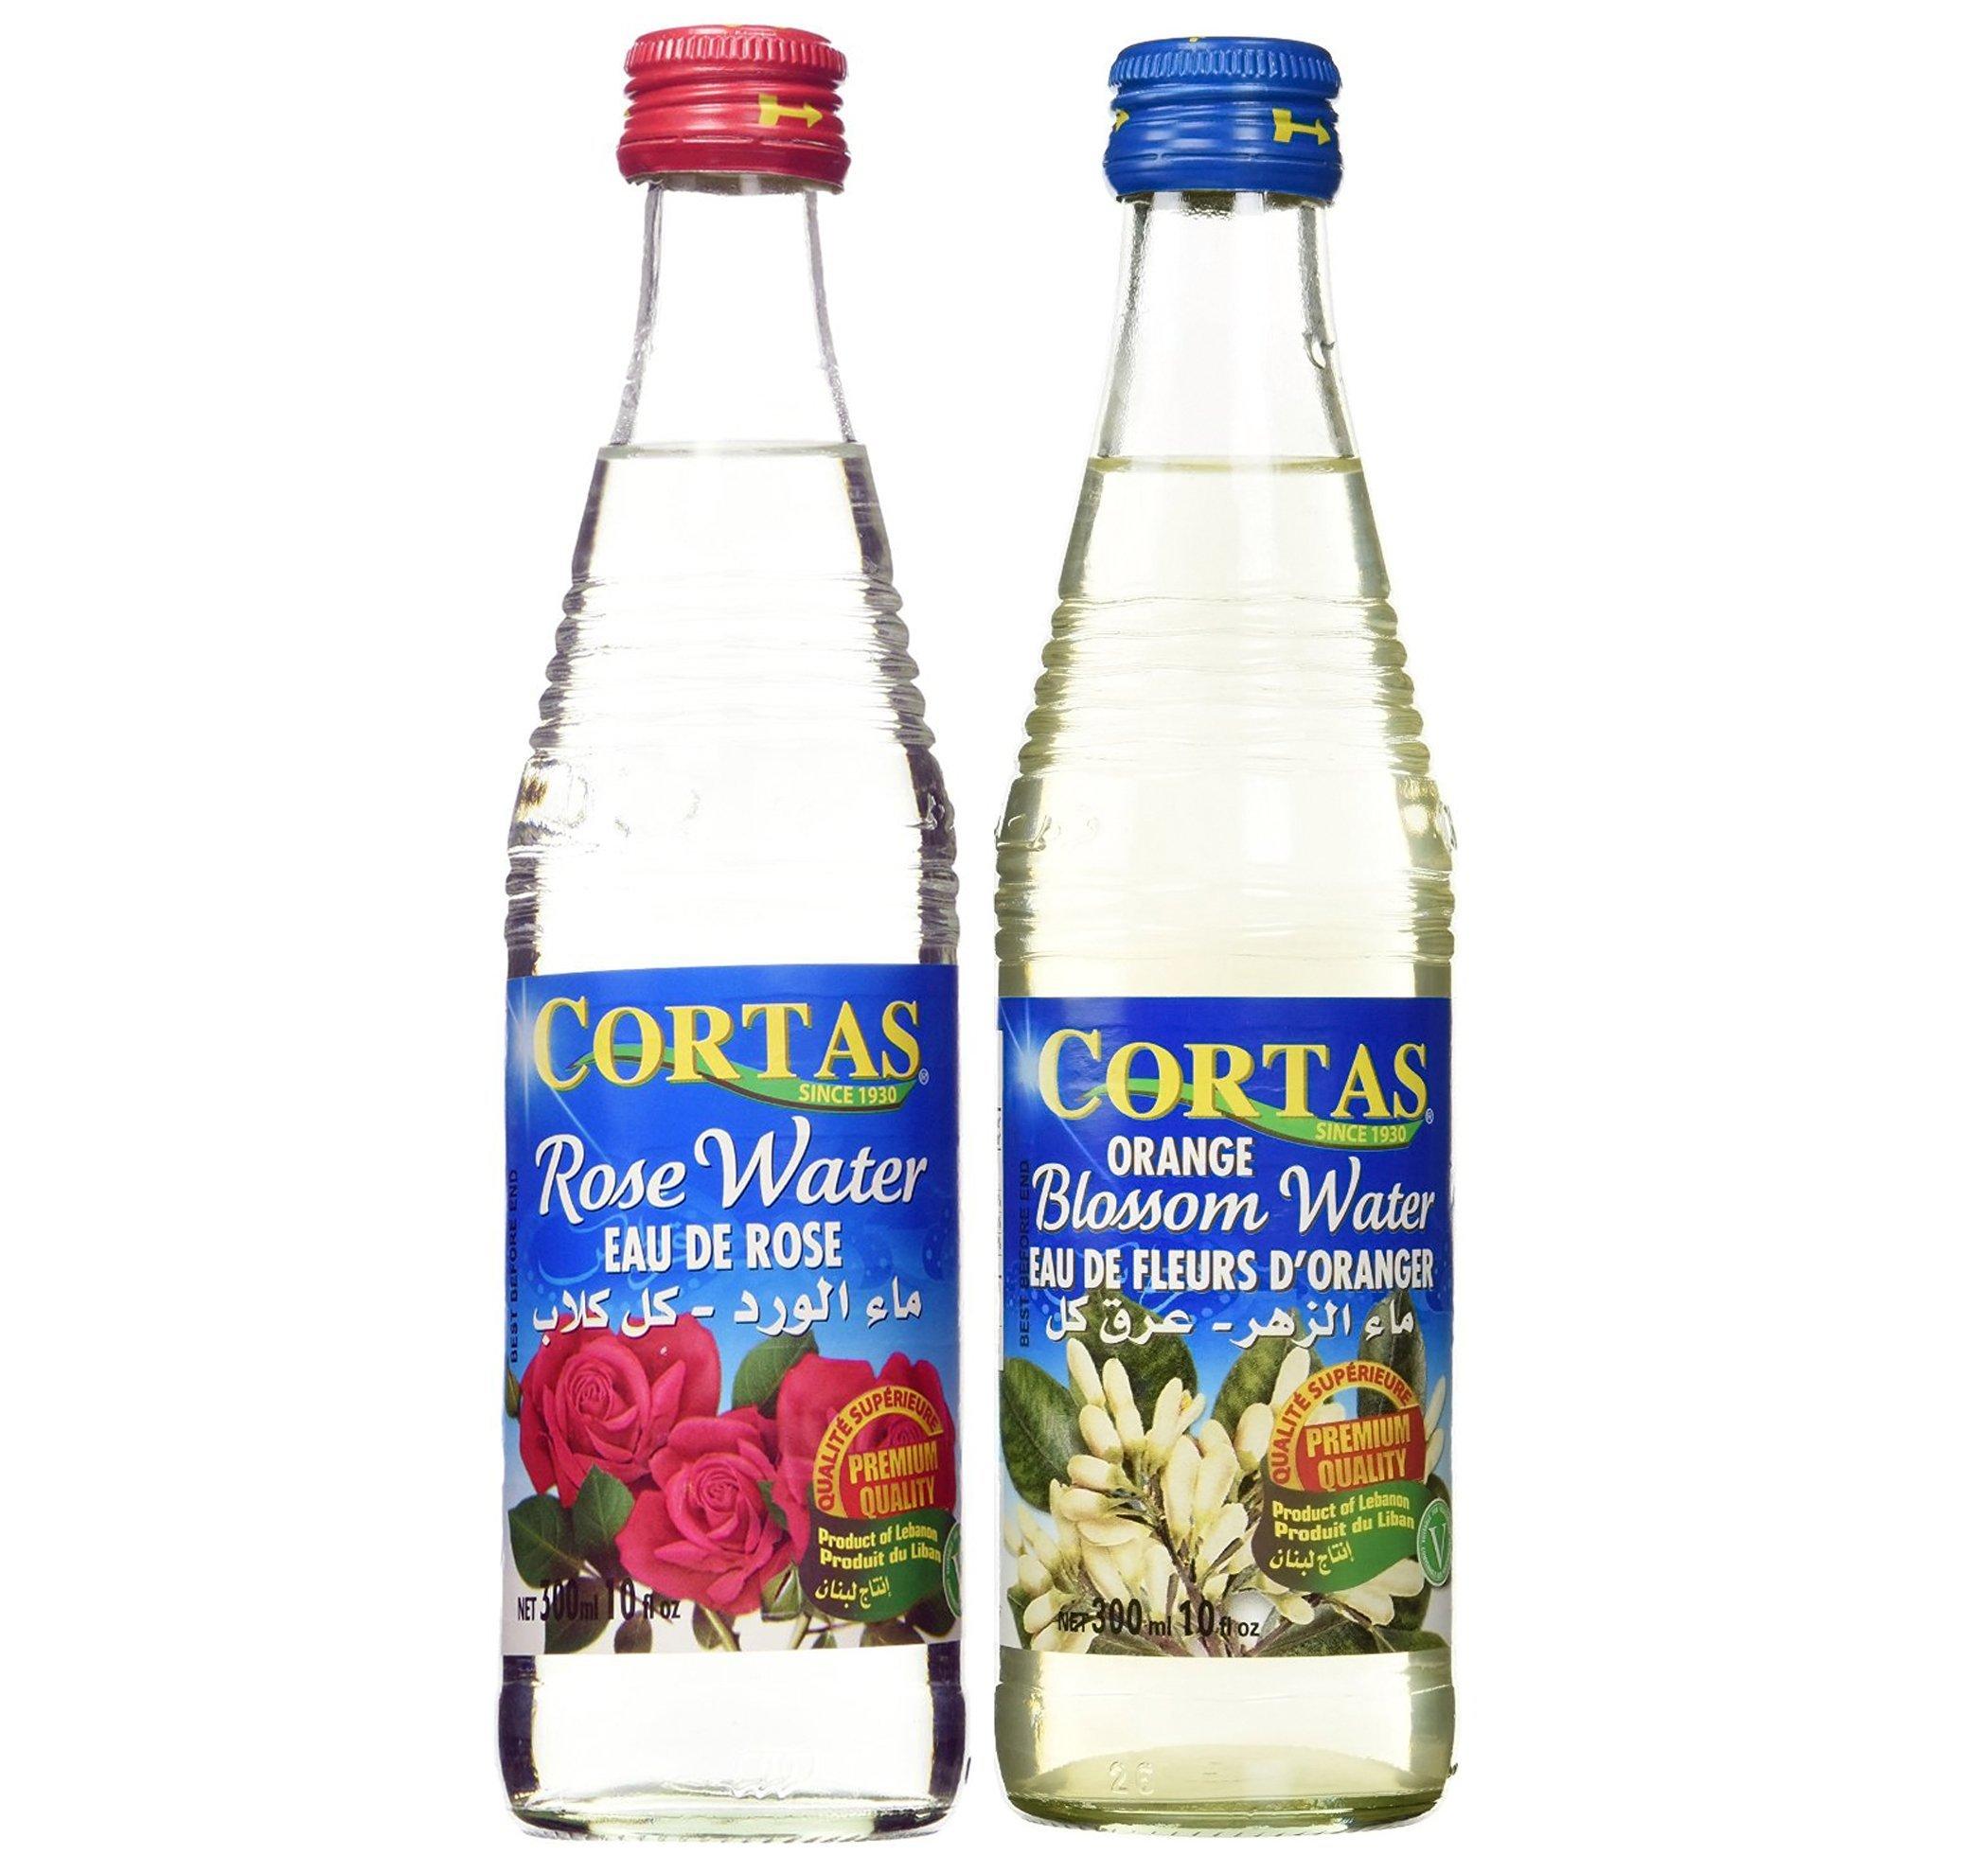 Cortas Combo Pack - 1) Cortas Rose Water 10 Fl. Oz., & 2) Cortas Orange Blossom Water 10 Fl. Oz - Total 2 Bottles